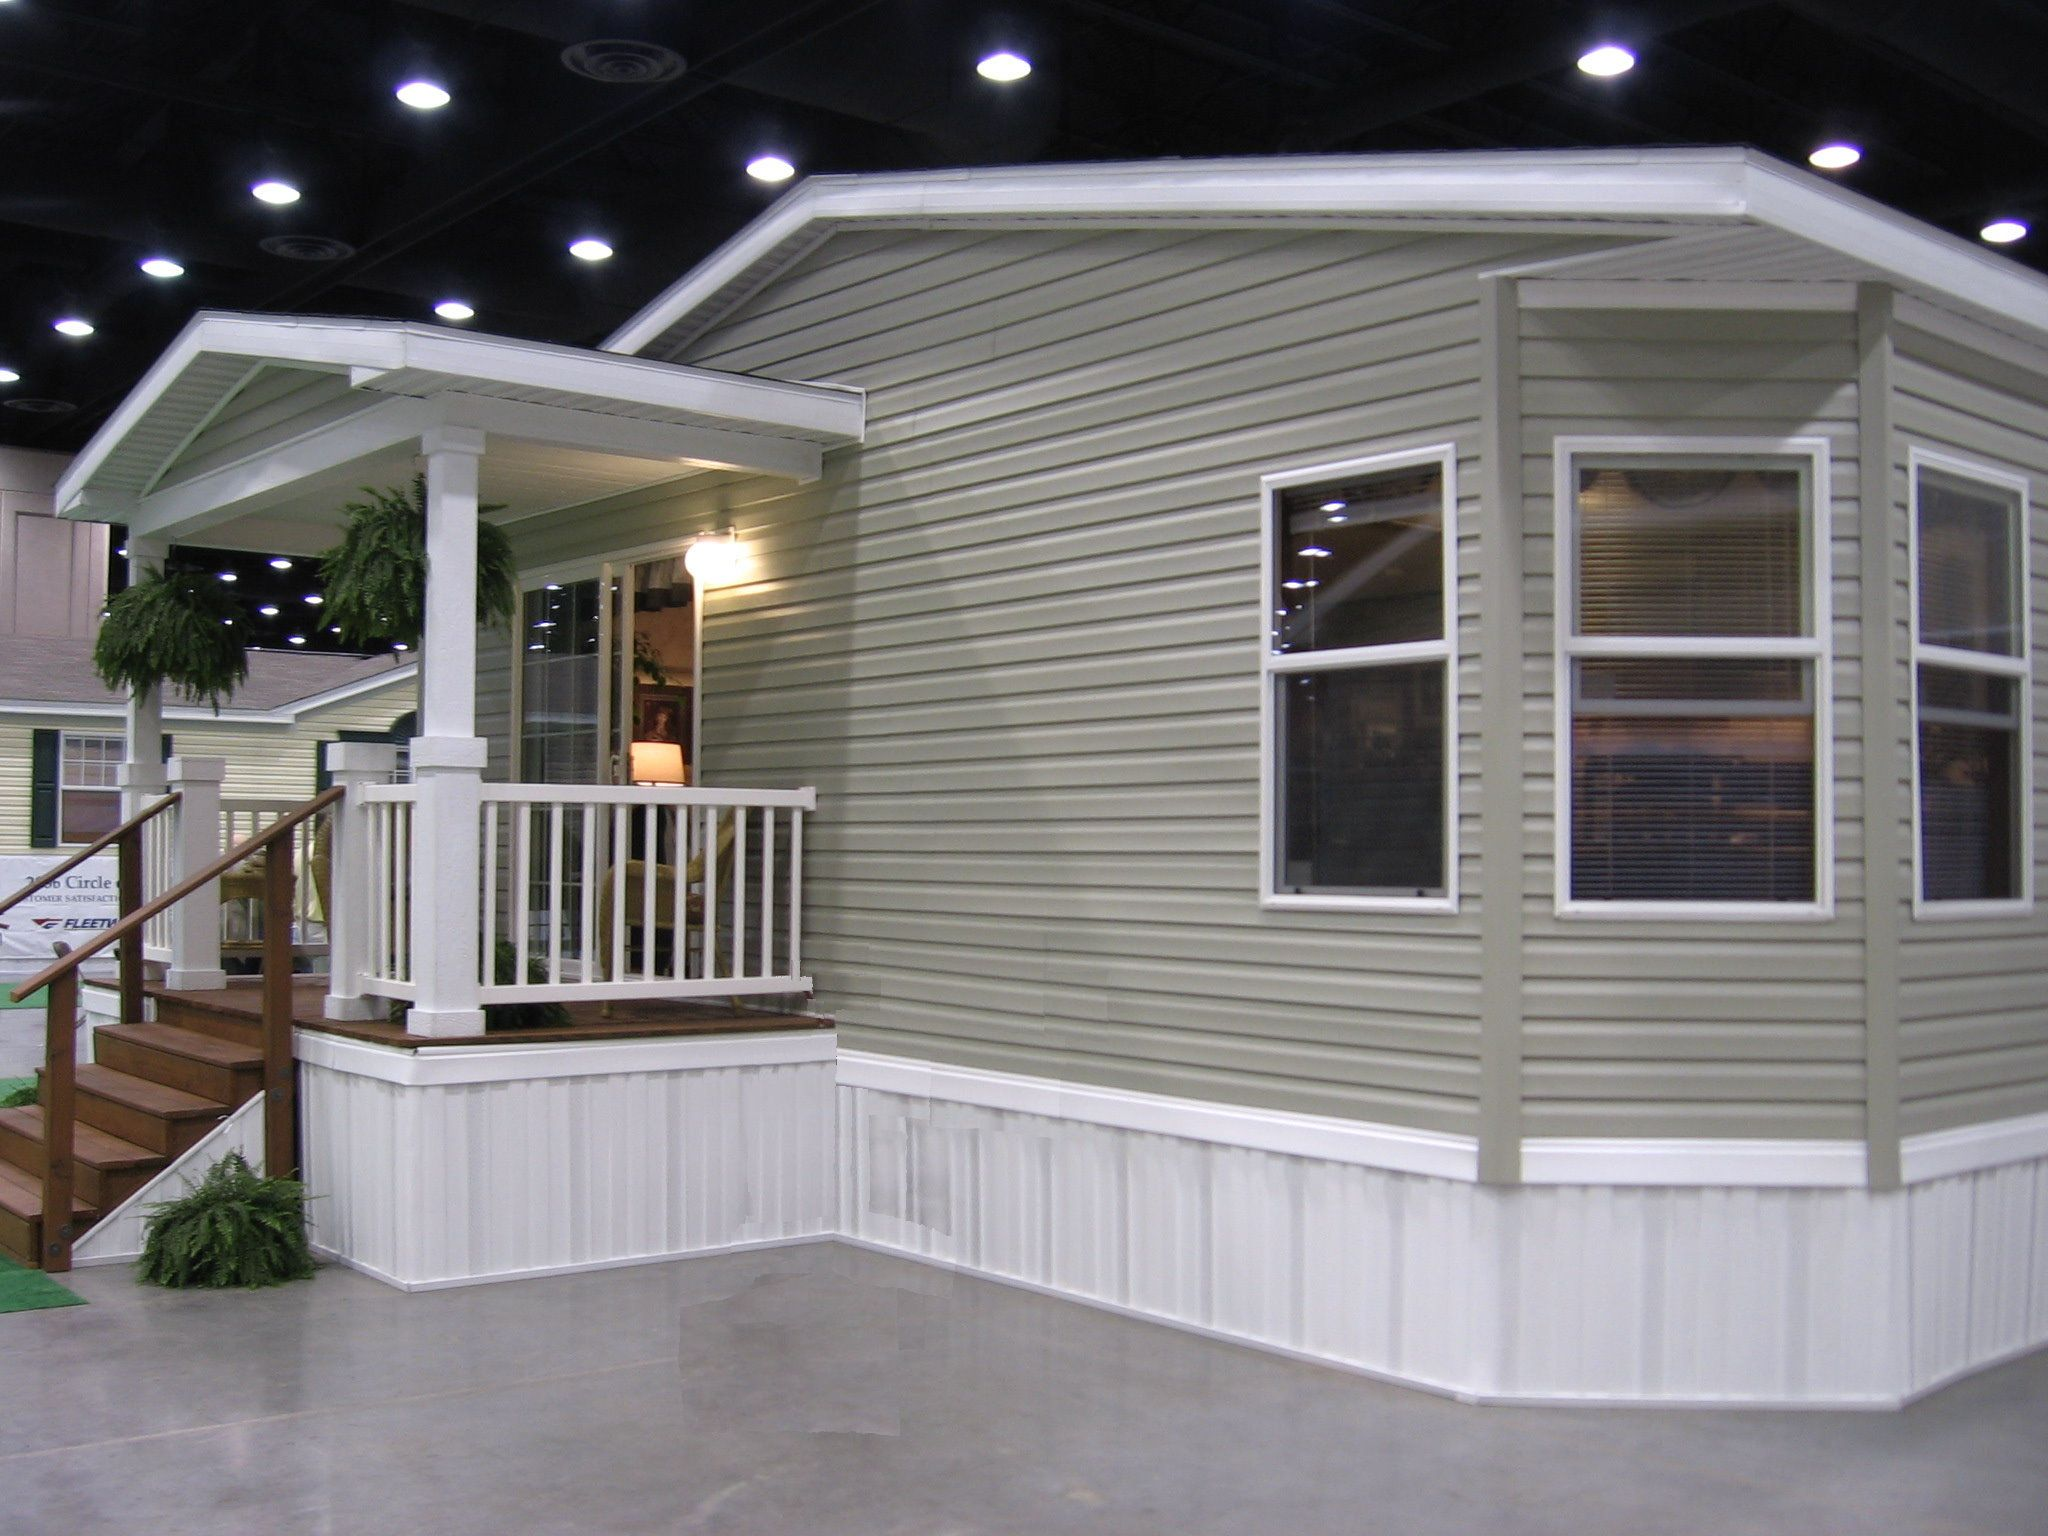 Mobile Home Deck Ideas PORCH DESIGNS FOR MOBILE HOMES Home